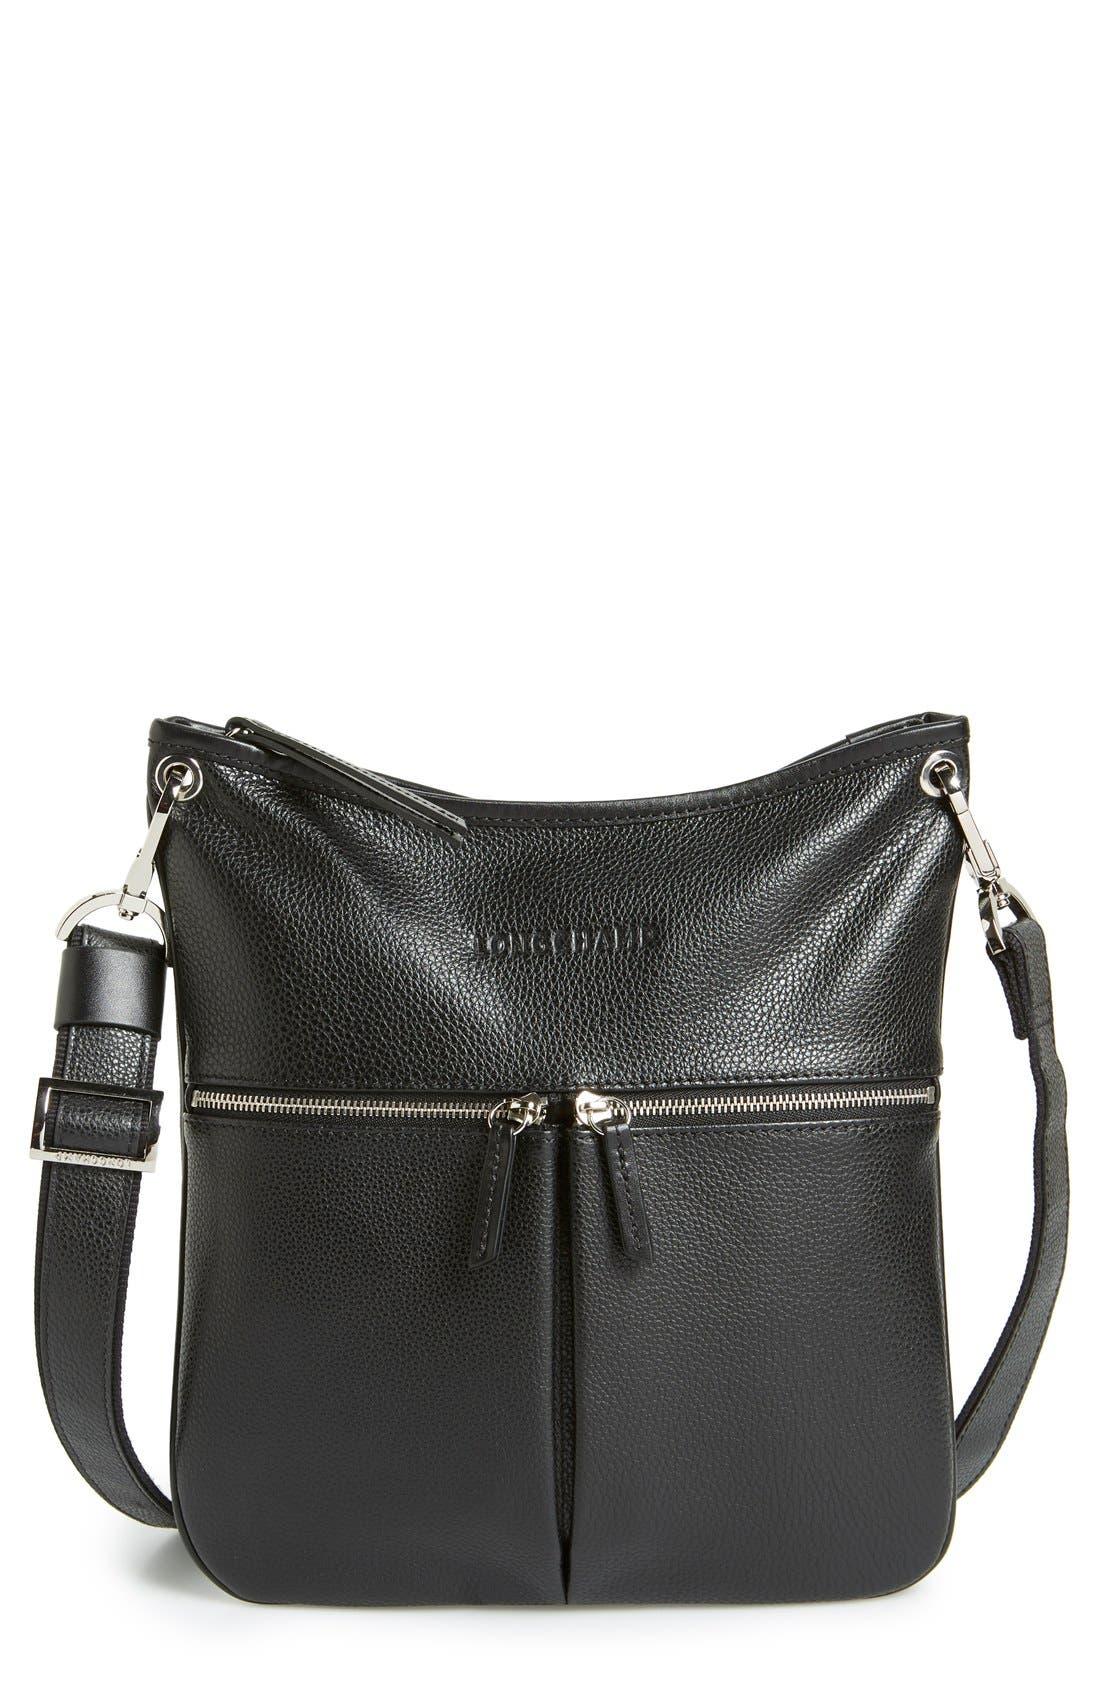 LONGCHAMP Veau Leather Crossbody Bag